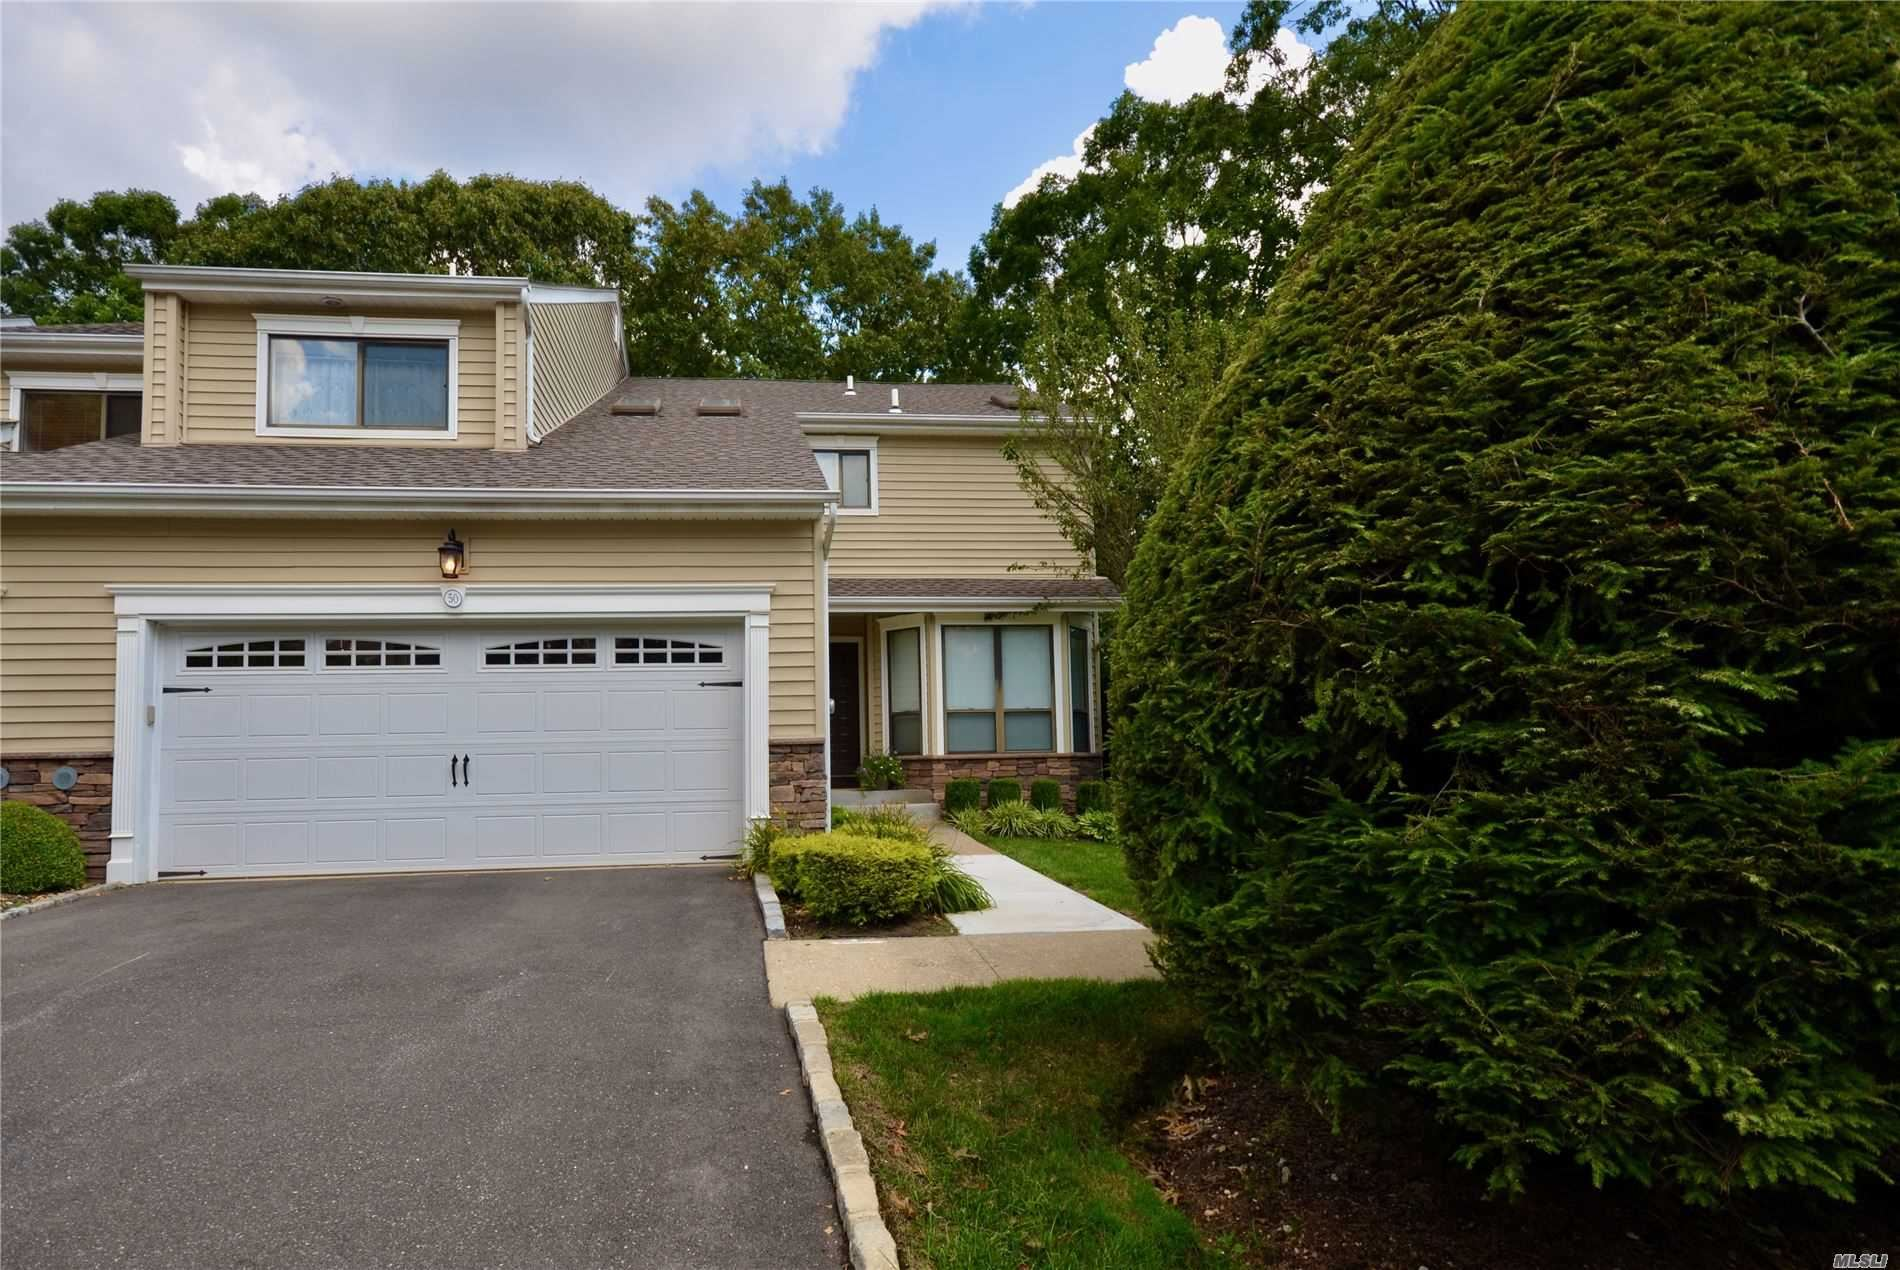 50 Villas Circle, Melville, NY 11747 - MLS#: 3237235